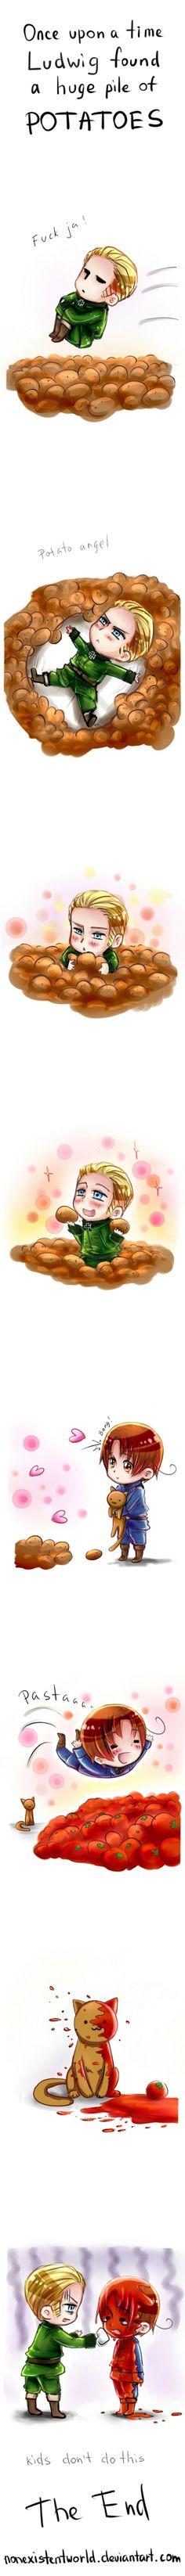 APH : Feli goes to heaven by NonexistentWorld.deviantart.com on @deviantART